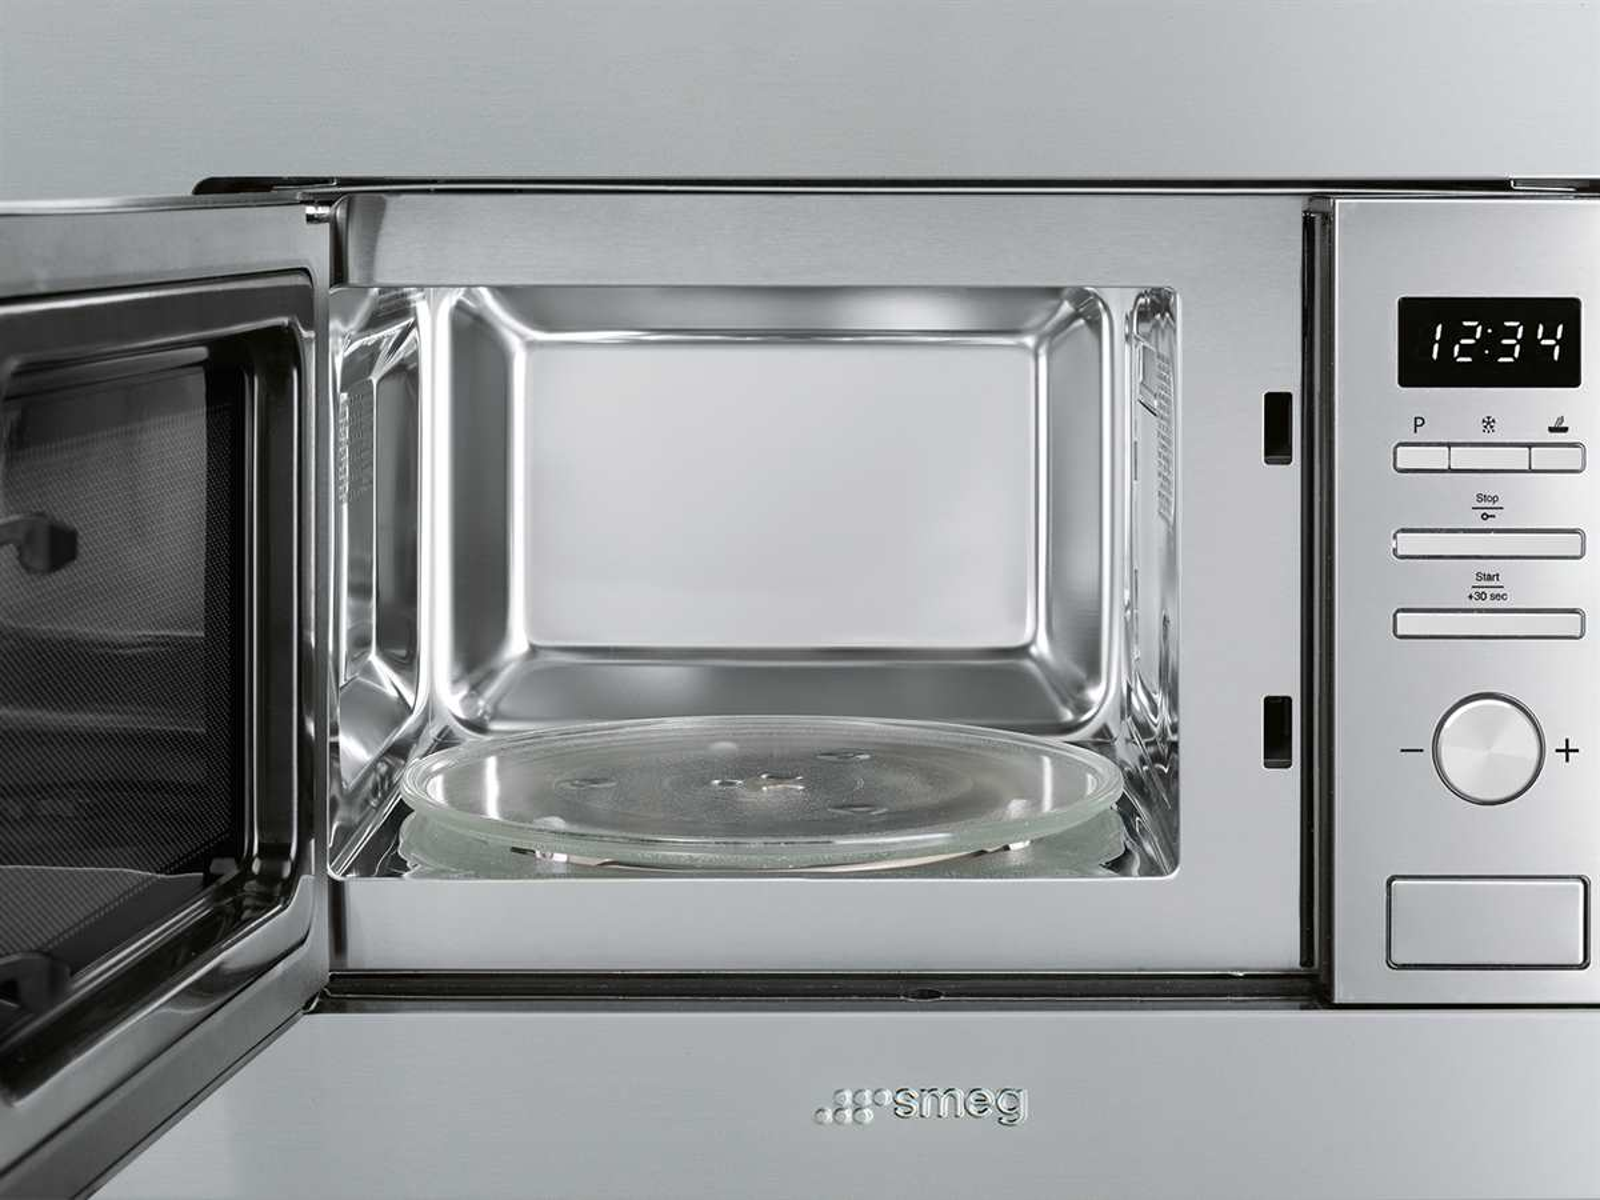 Smeg FMI020X Kompakt Mikrowelle mit Grill Edelstahl